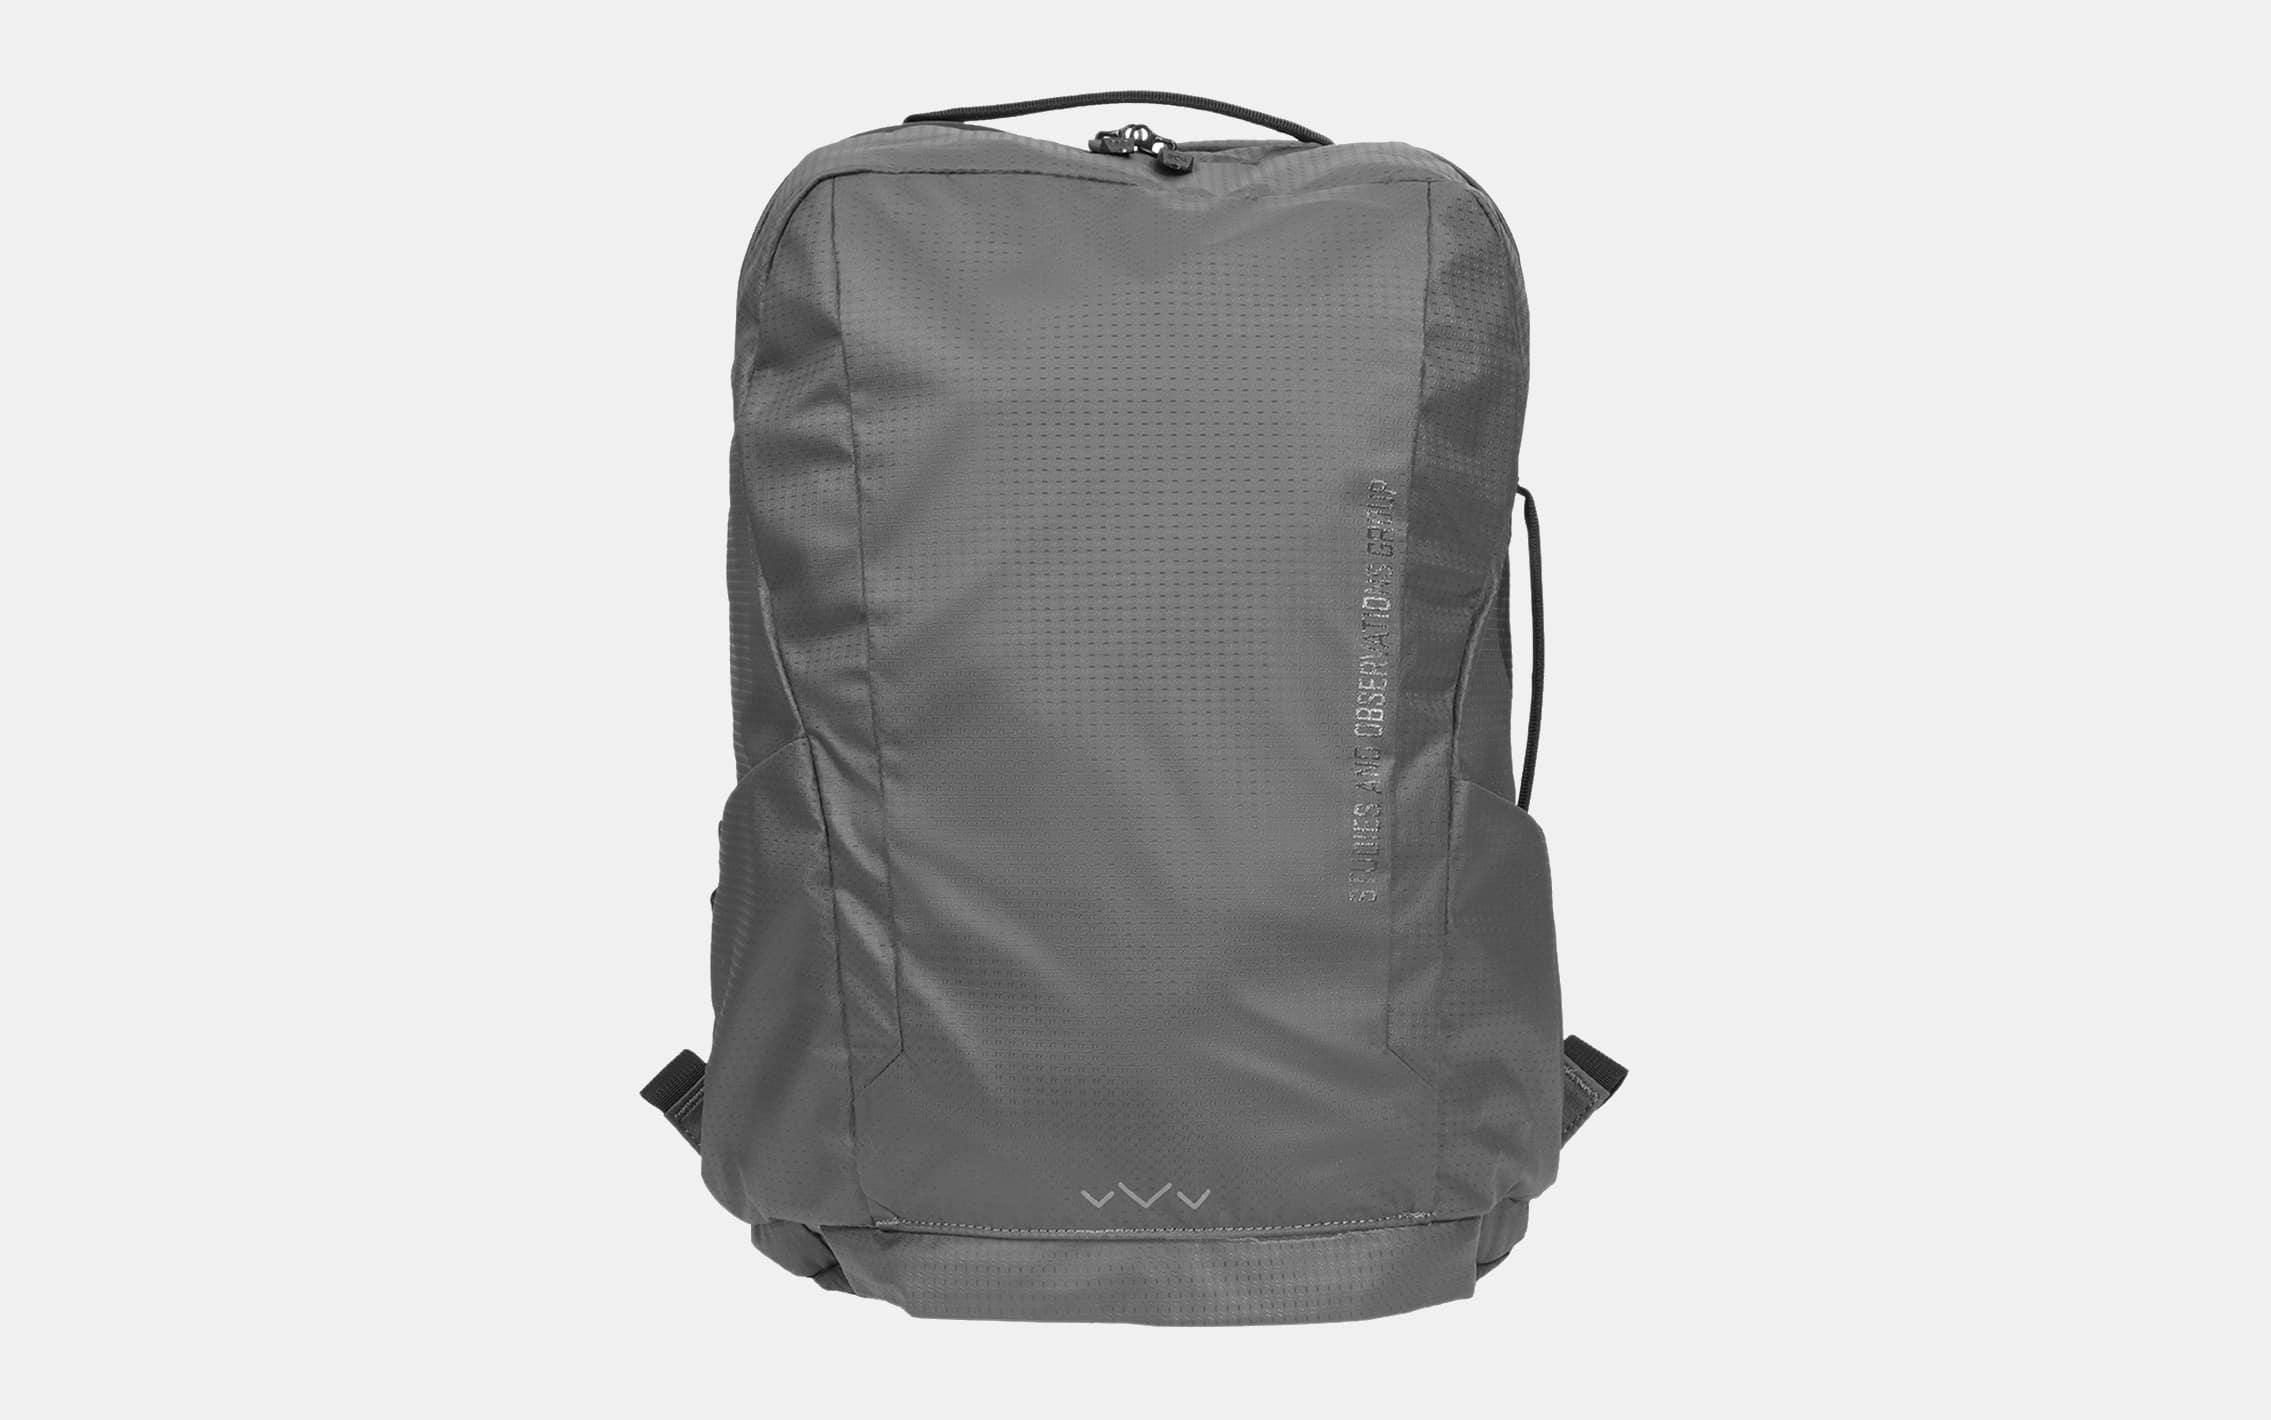 SOG Surrept/16 CS Daypack